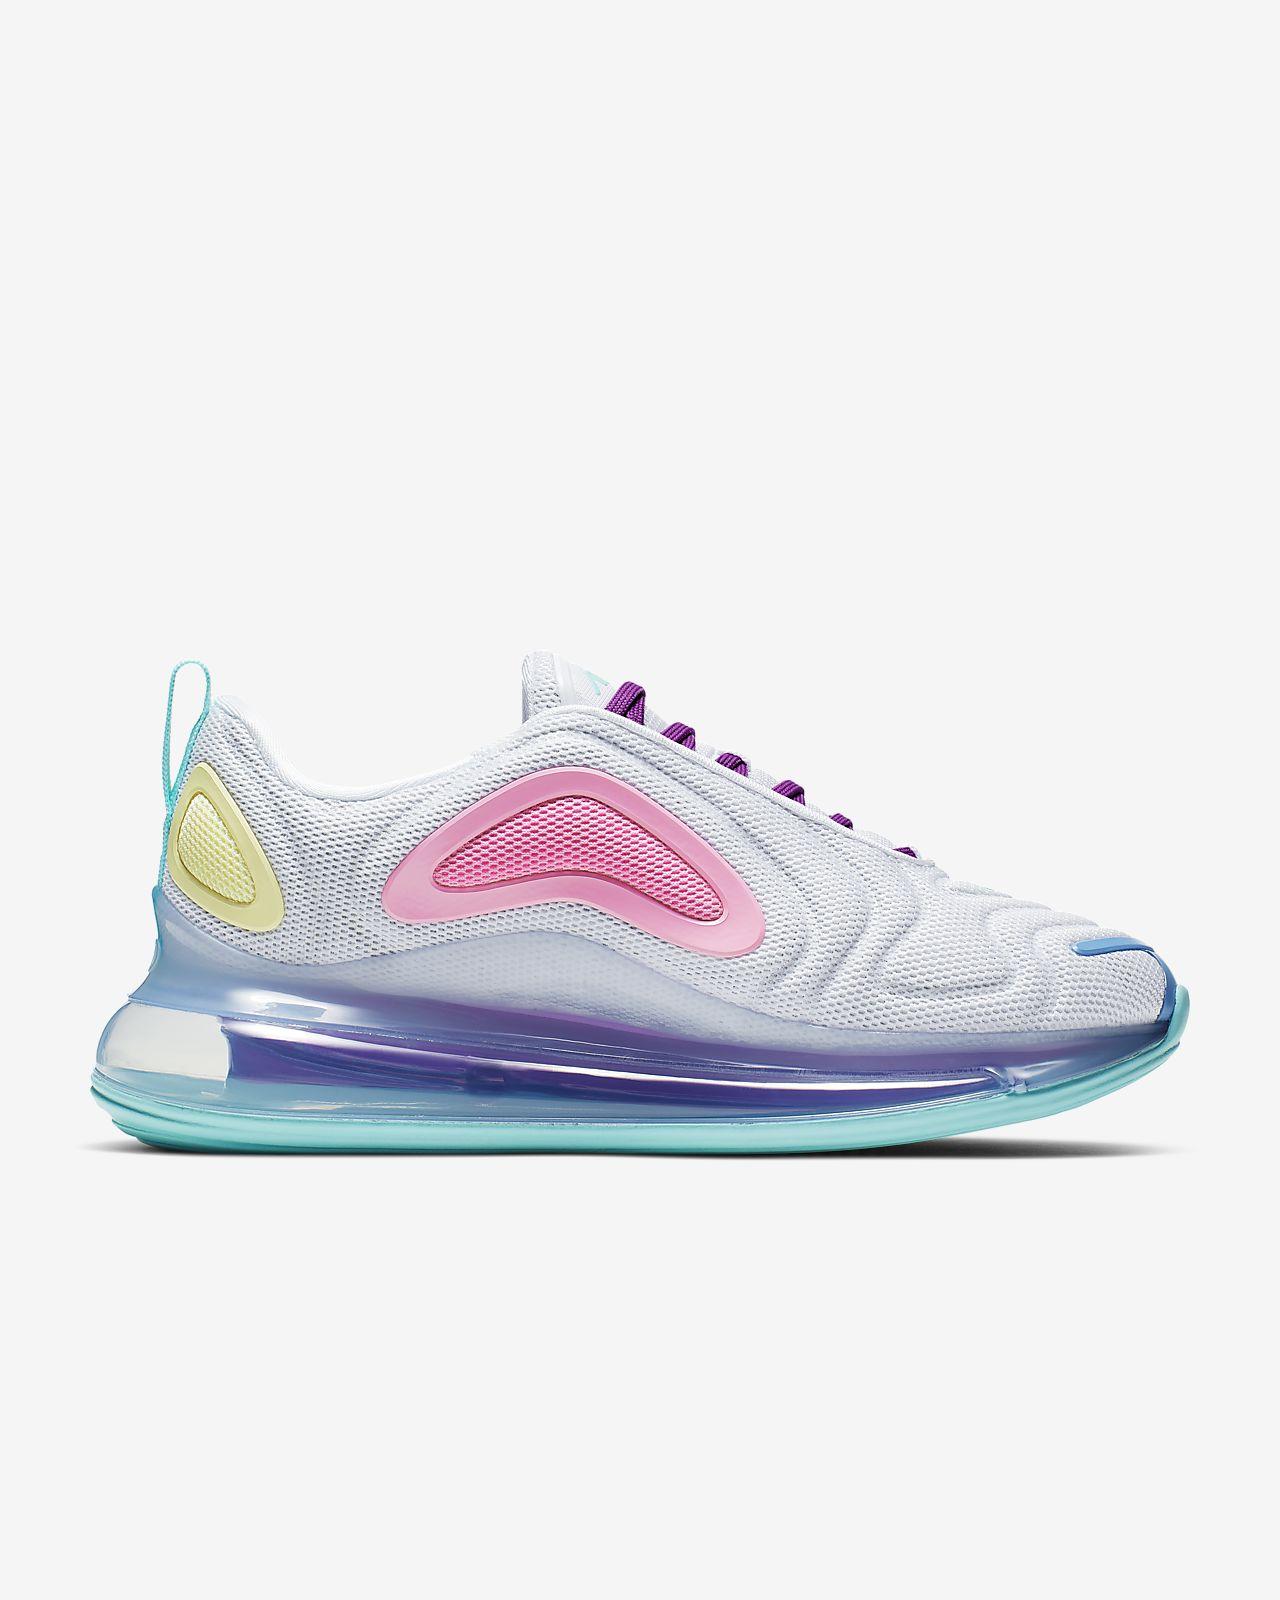 5408d00d4 Nike Air Max 720 Women's Shoe. Nike.com